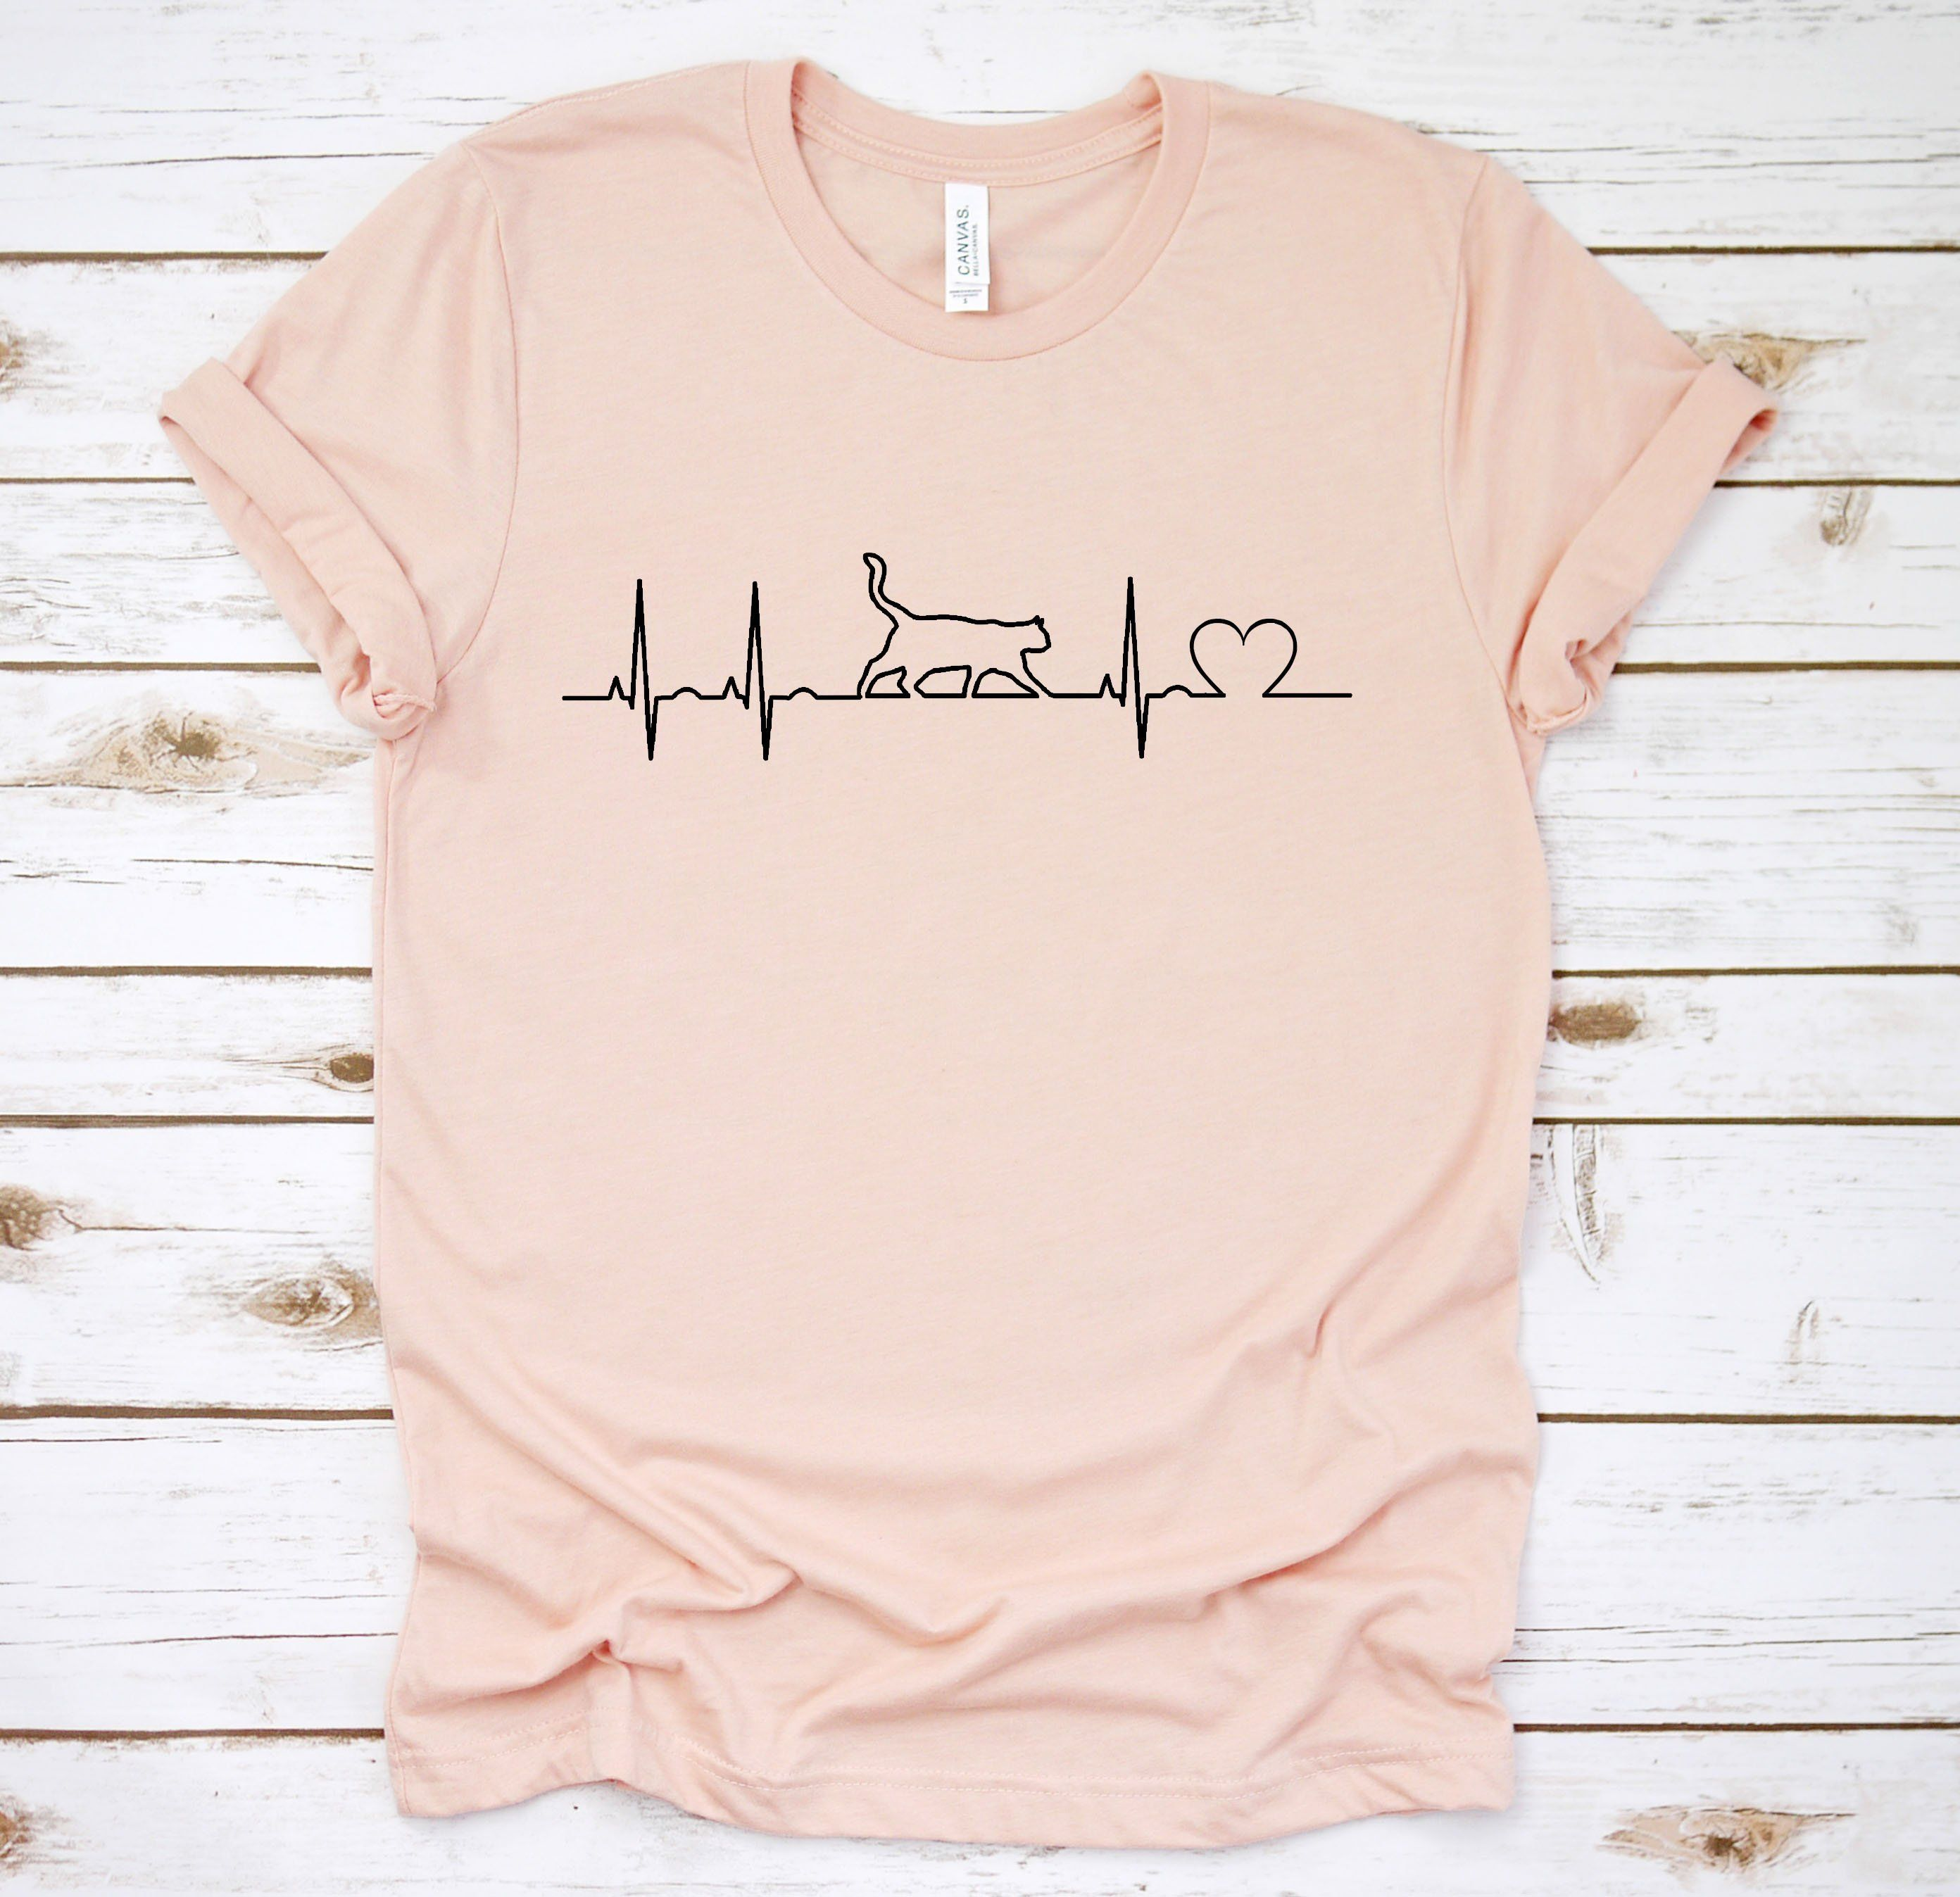 6b6dfc0985 Cat Ekg T Shirt, Cat Heartbeat, Gift For Cat Lover, Cute Cat Shirt ...